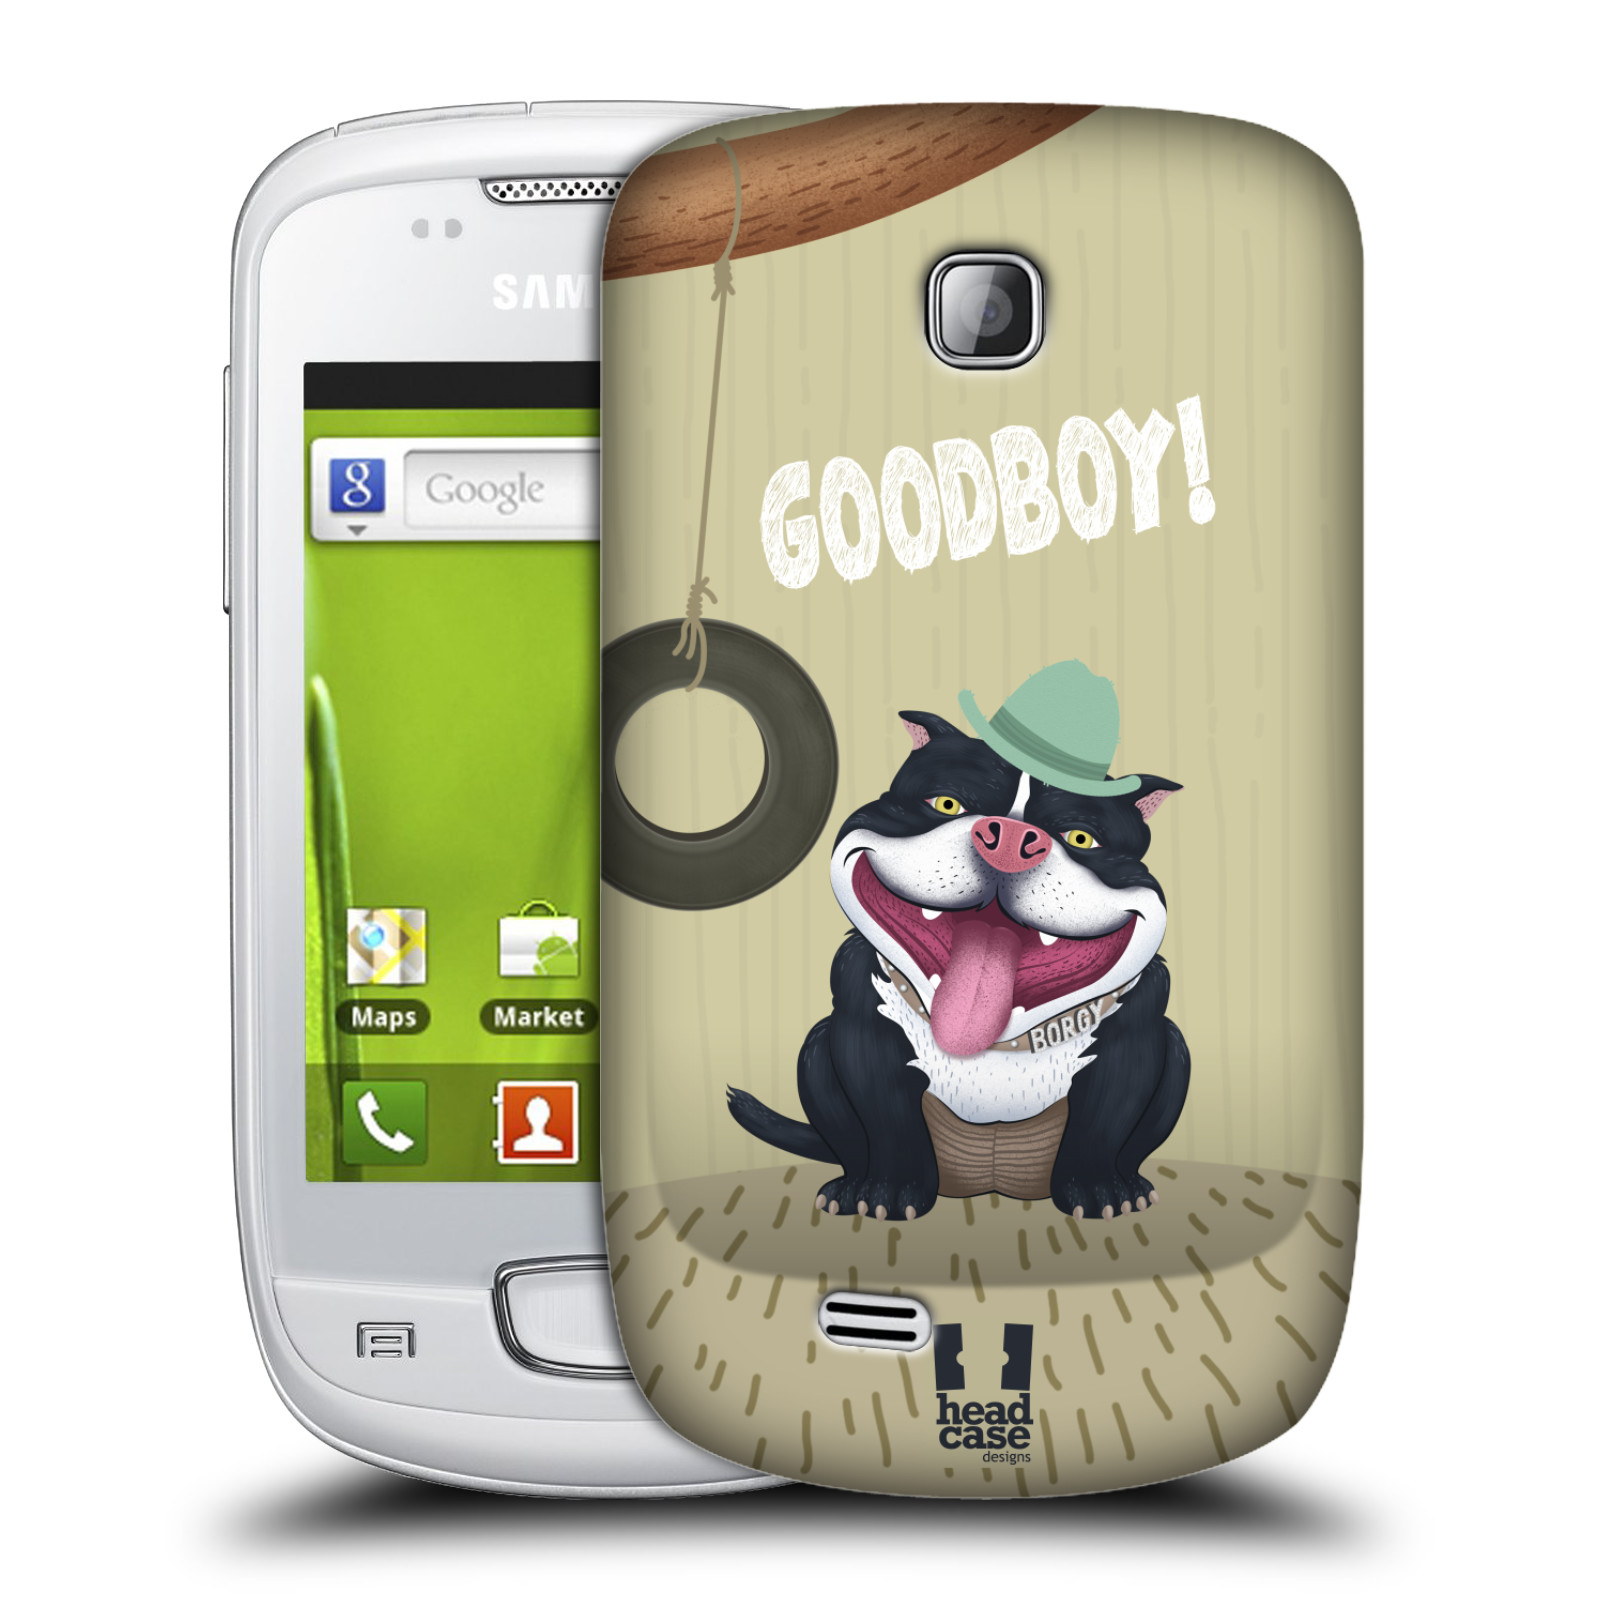 Plastové pouzdro na mobil Samsung Galaxy Mini HEAD CASE Goodboy! Pejsek (Kryt či obal na mobilní telefon Samsung Galaxy Mini GT-S5570 / GT-S5570i)